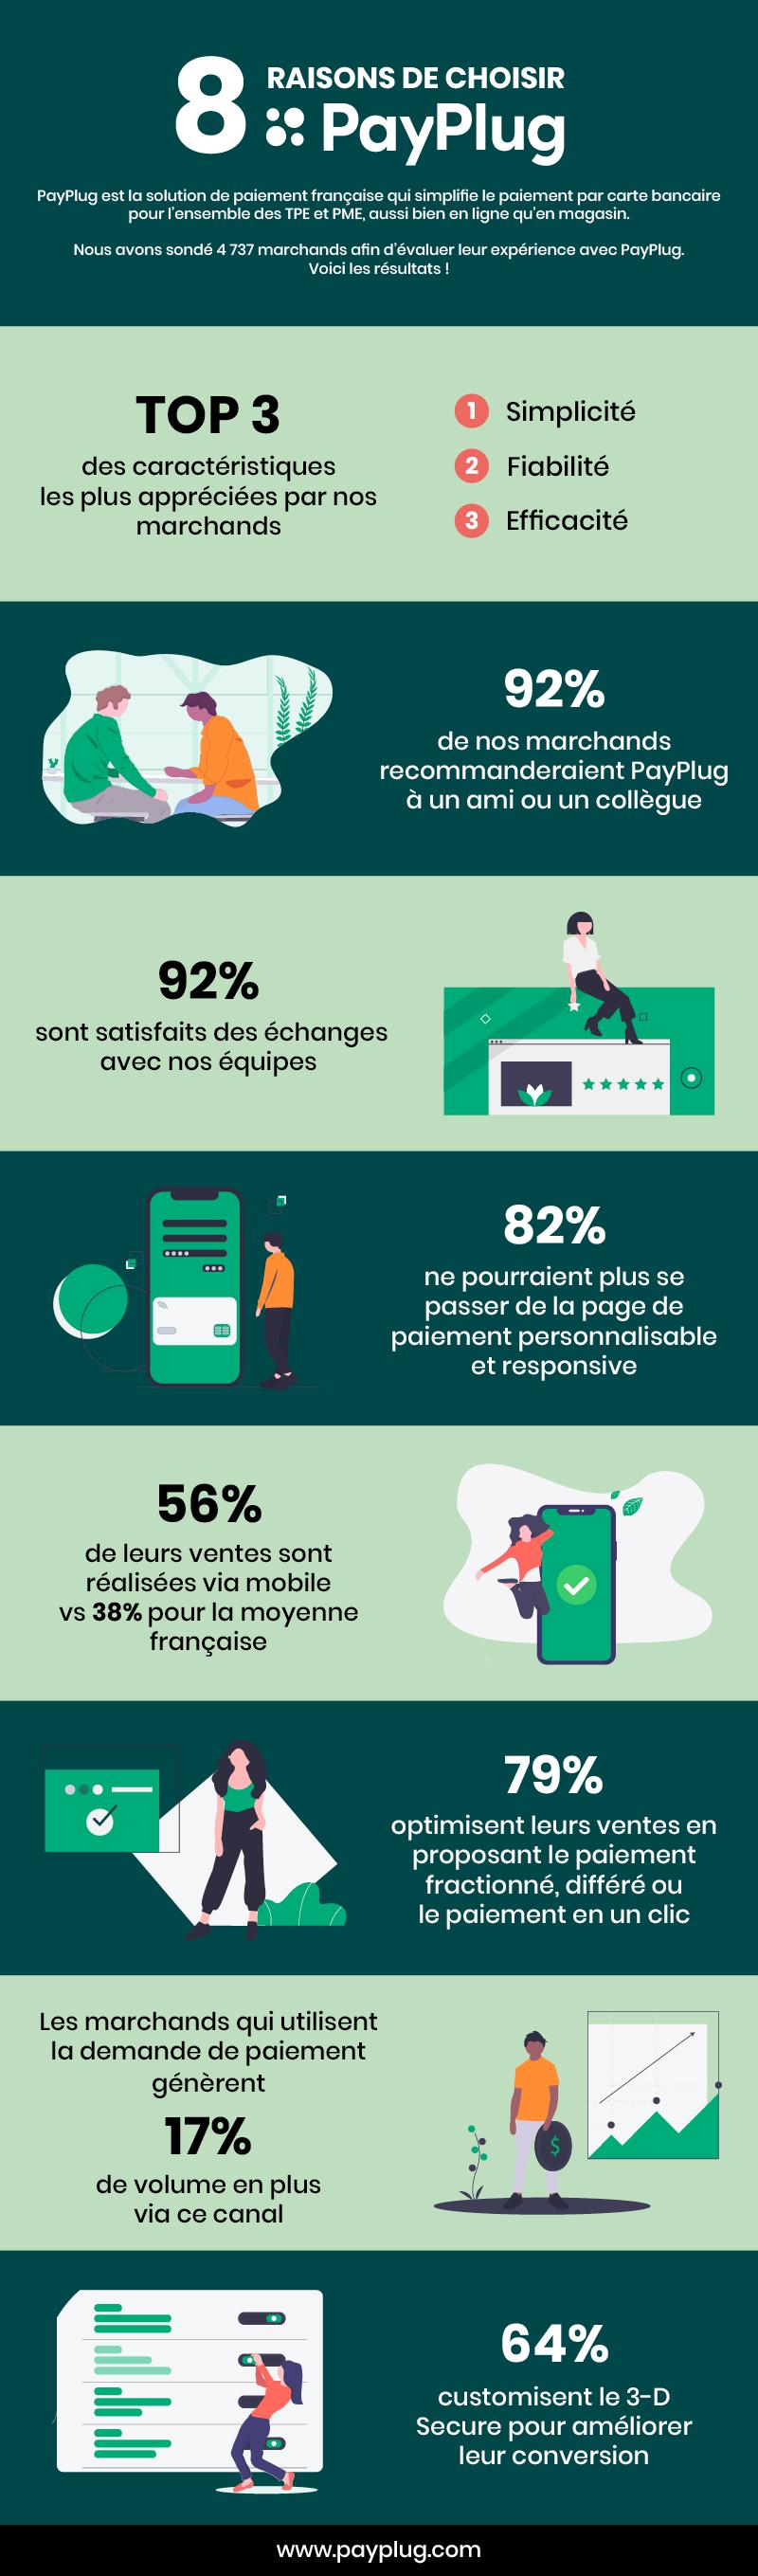 Infographie 8 raisons de choisir PayPlug